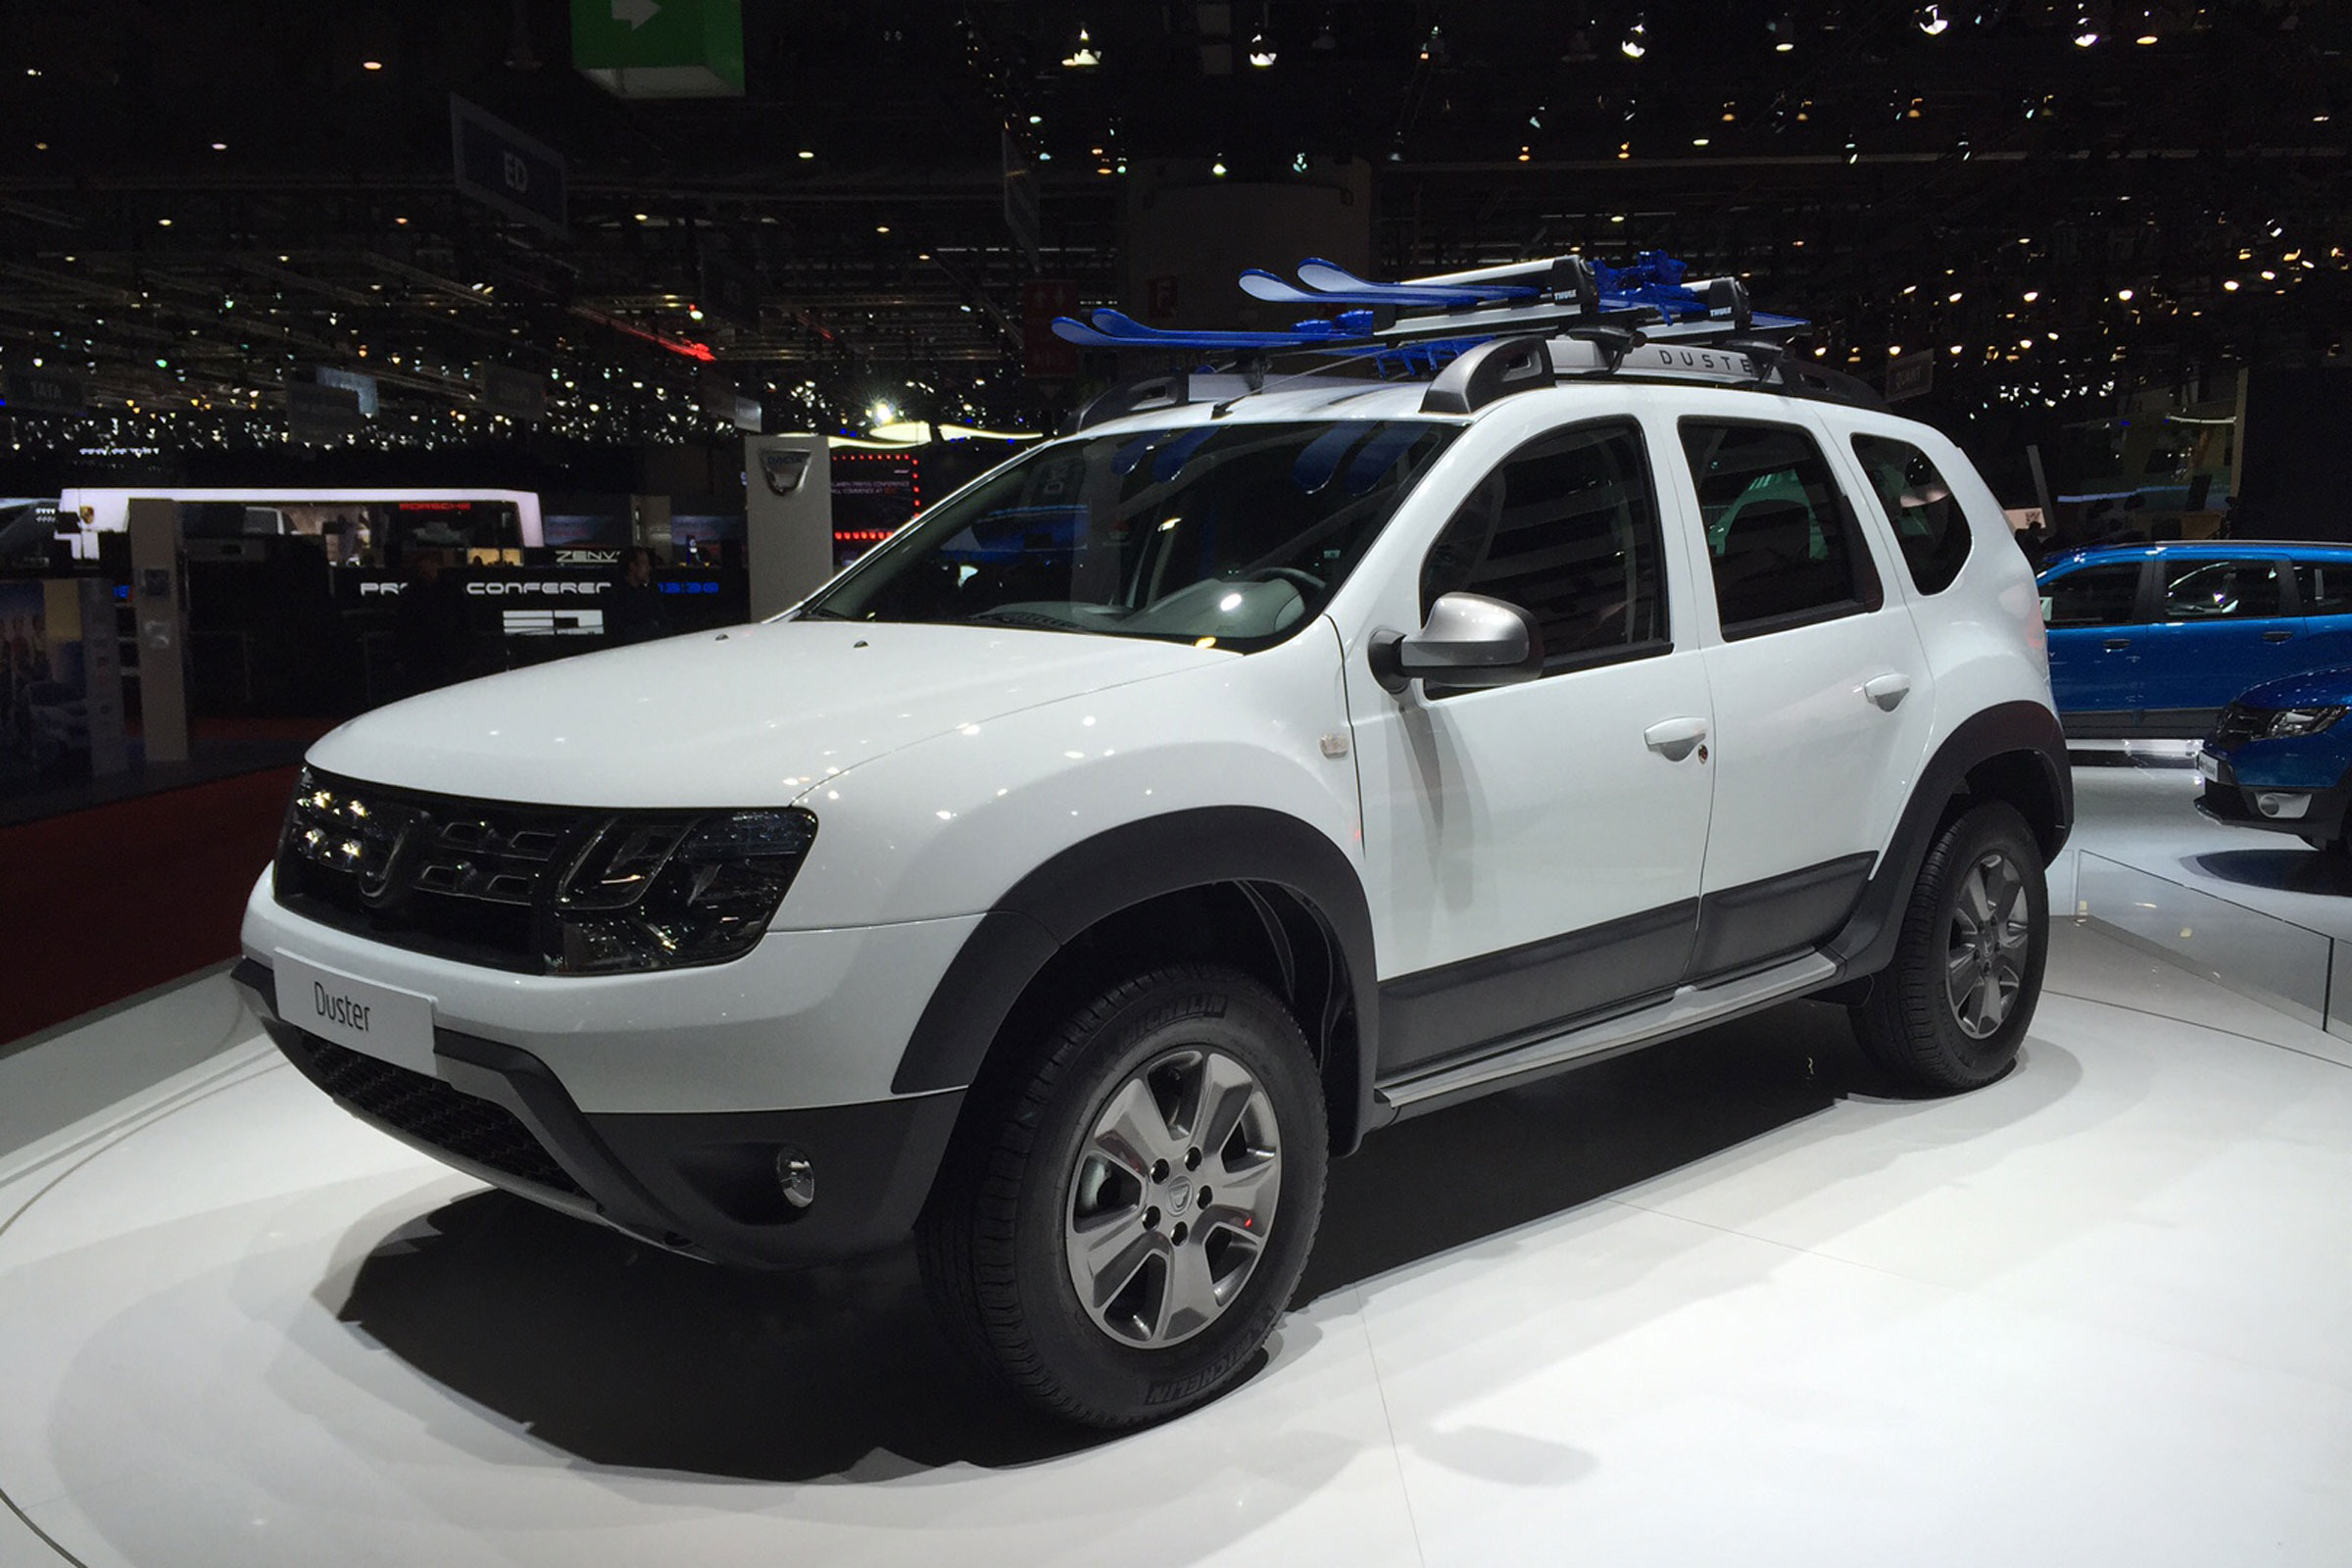 Dacia Duster 2016 1.2 01